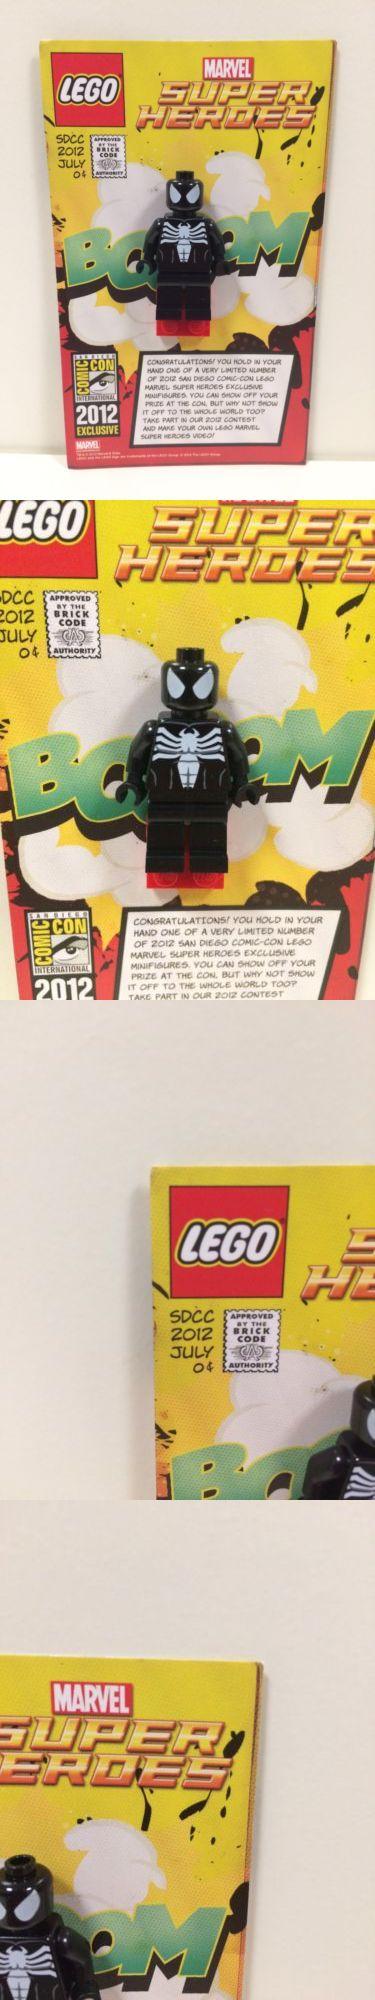 Minifigures 19001: Lego Comic Con Sdcc 2012 Black Spiderman Venom Minifigure Exclusive Rare -> BUY IT NOW ONLY: $400 on eBay!